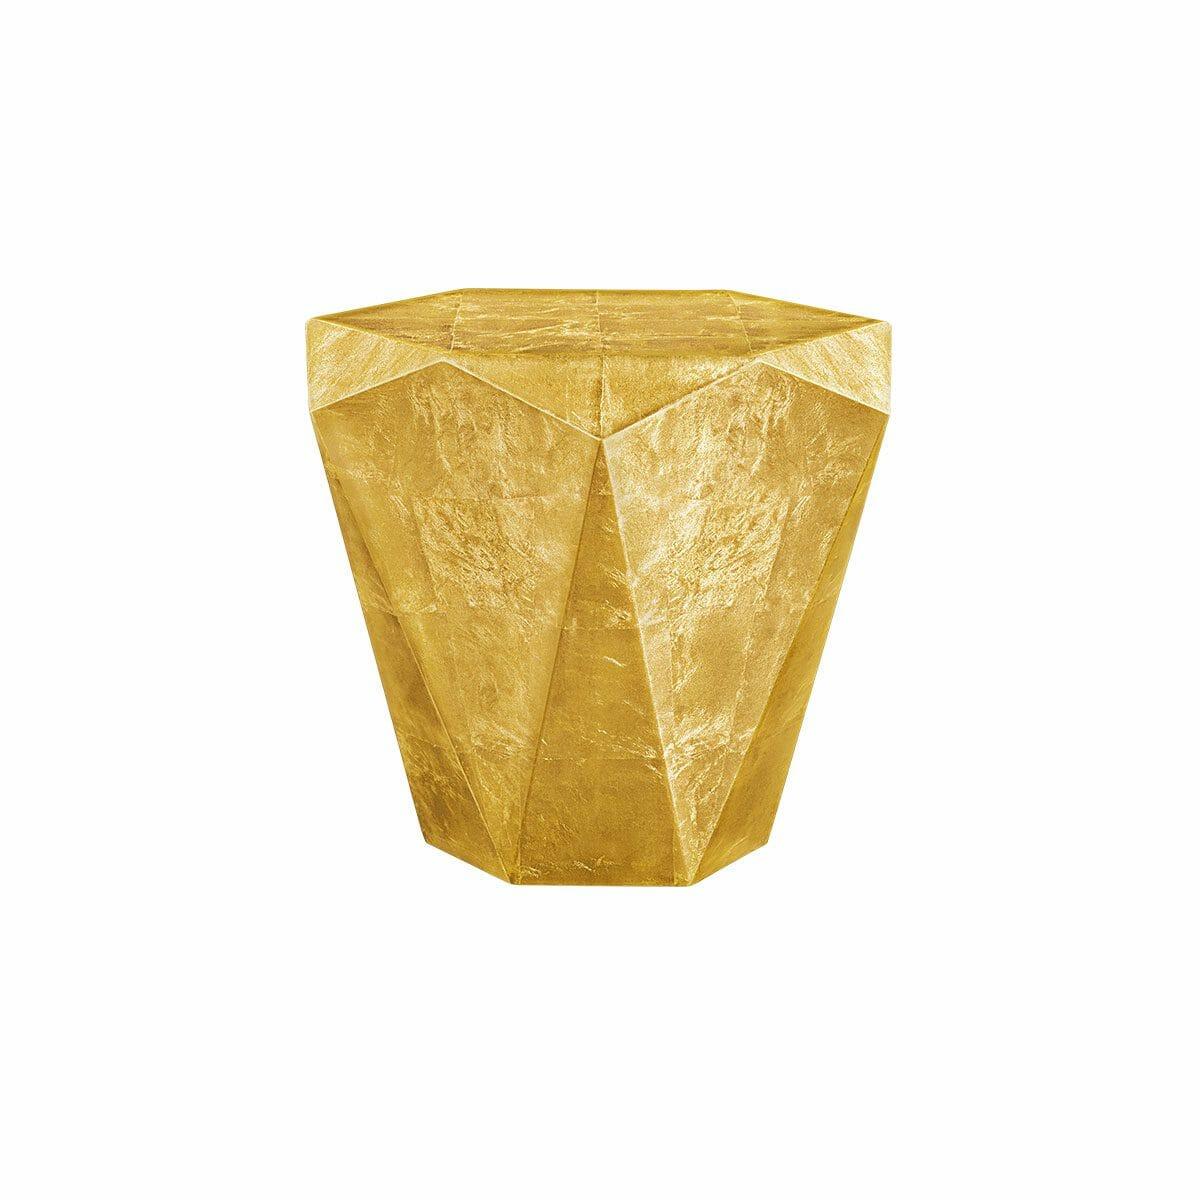 Bretz Stealth Beistelltisch B145G Messing-Blatt golden